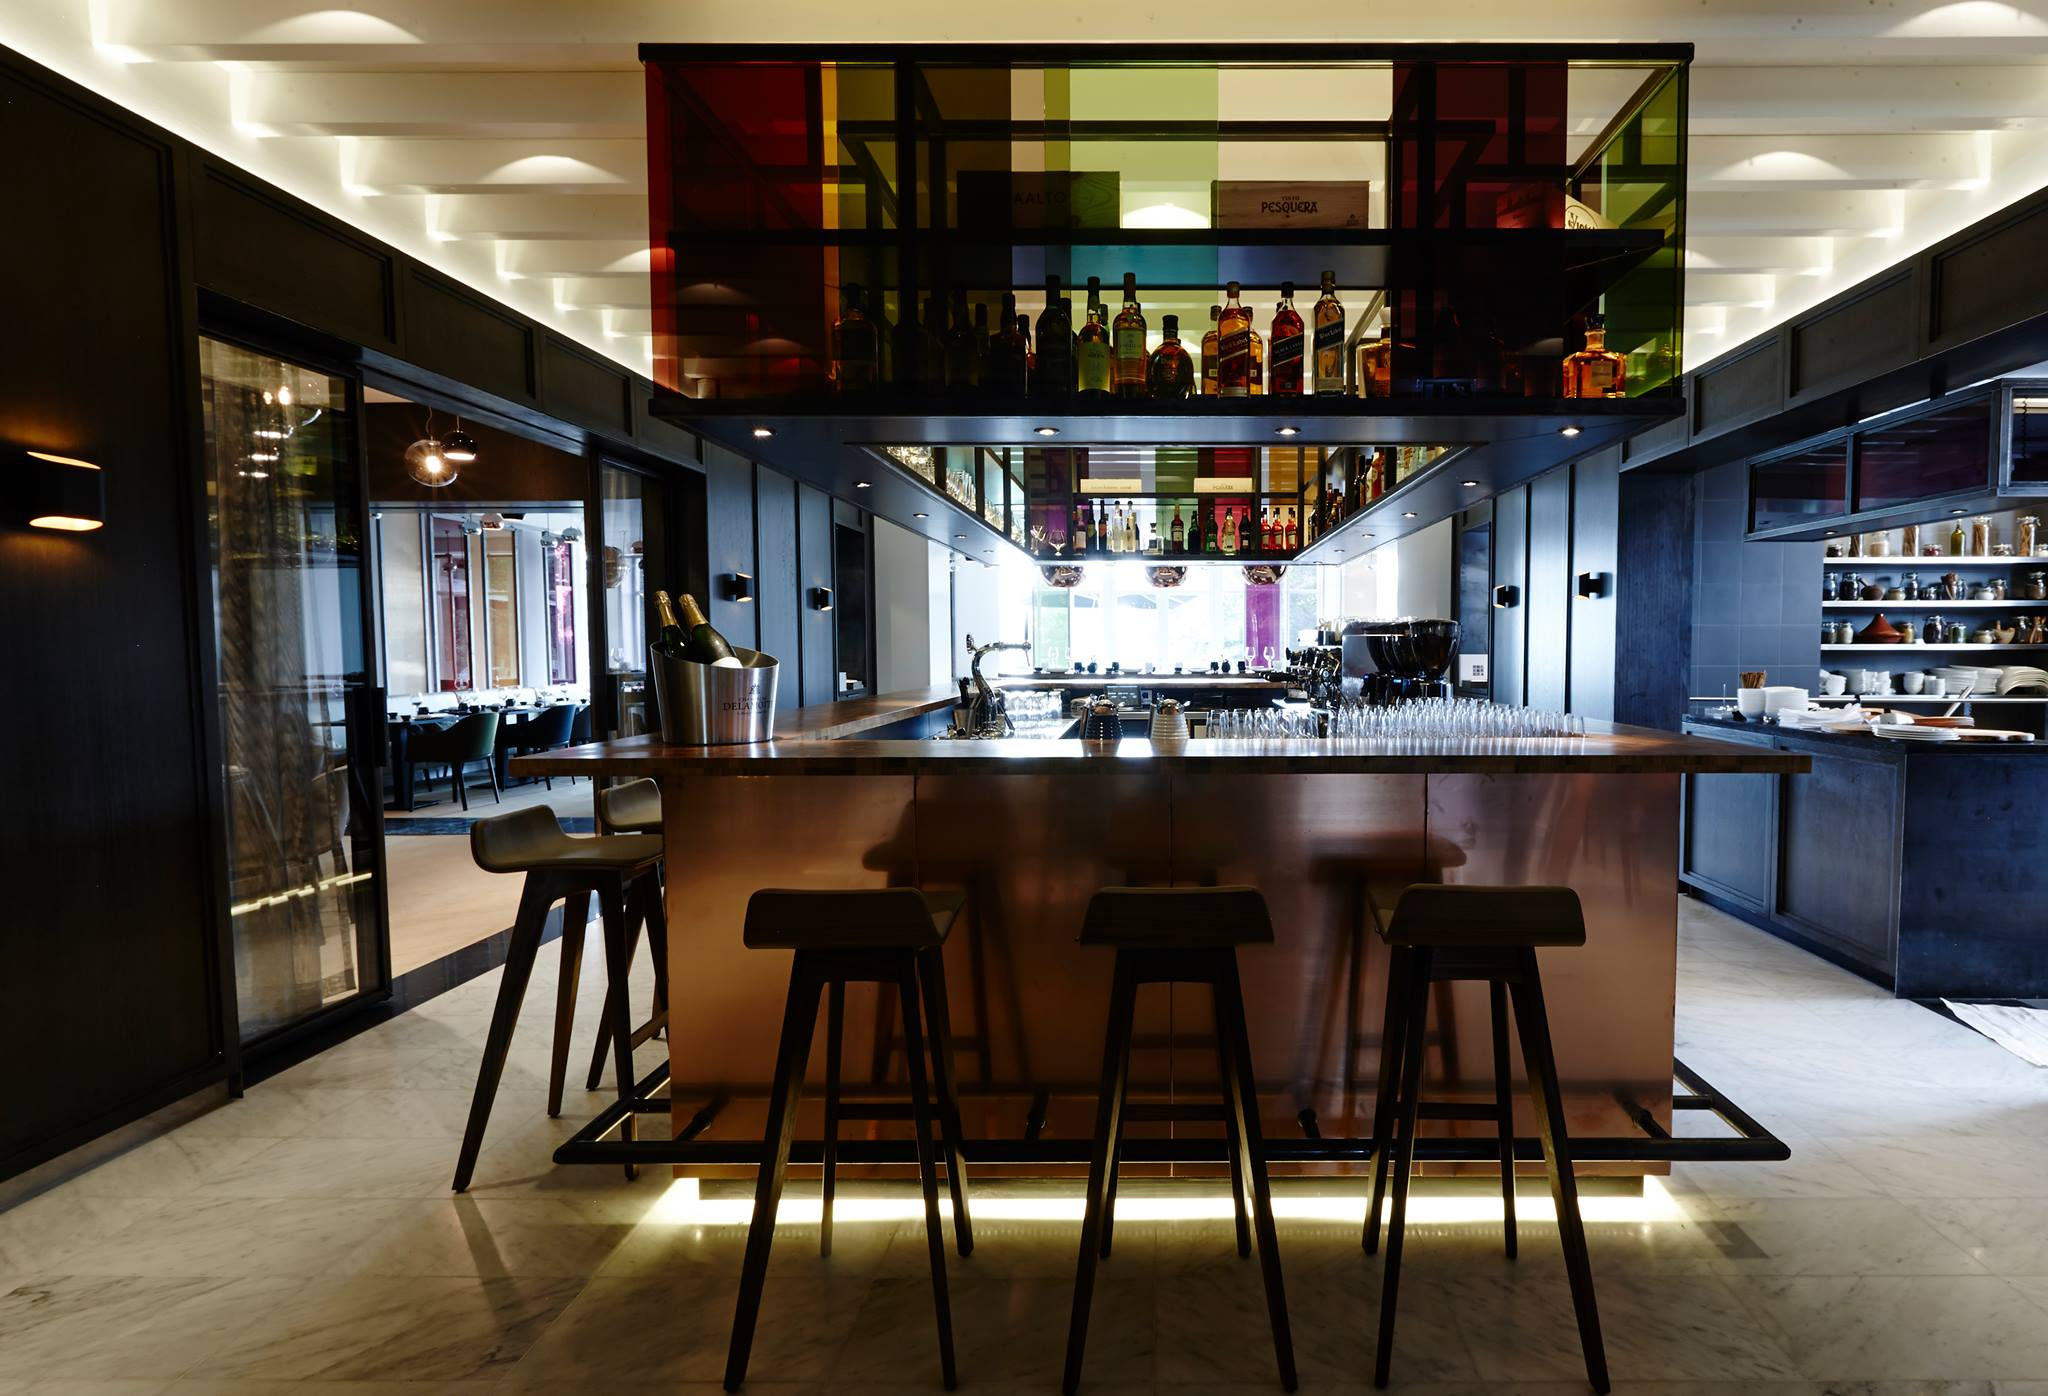 Bar met open keuken kriskookt - Open keuken bar ...